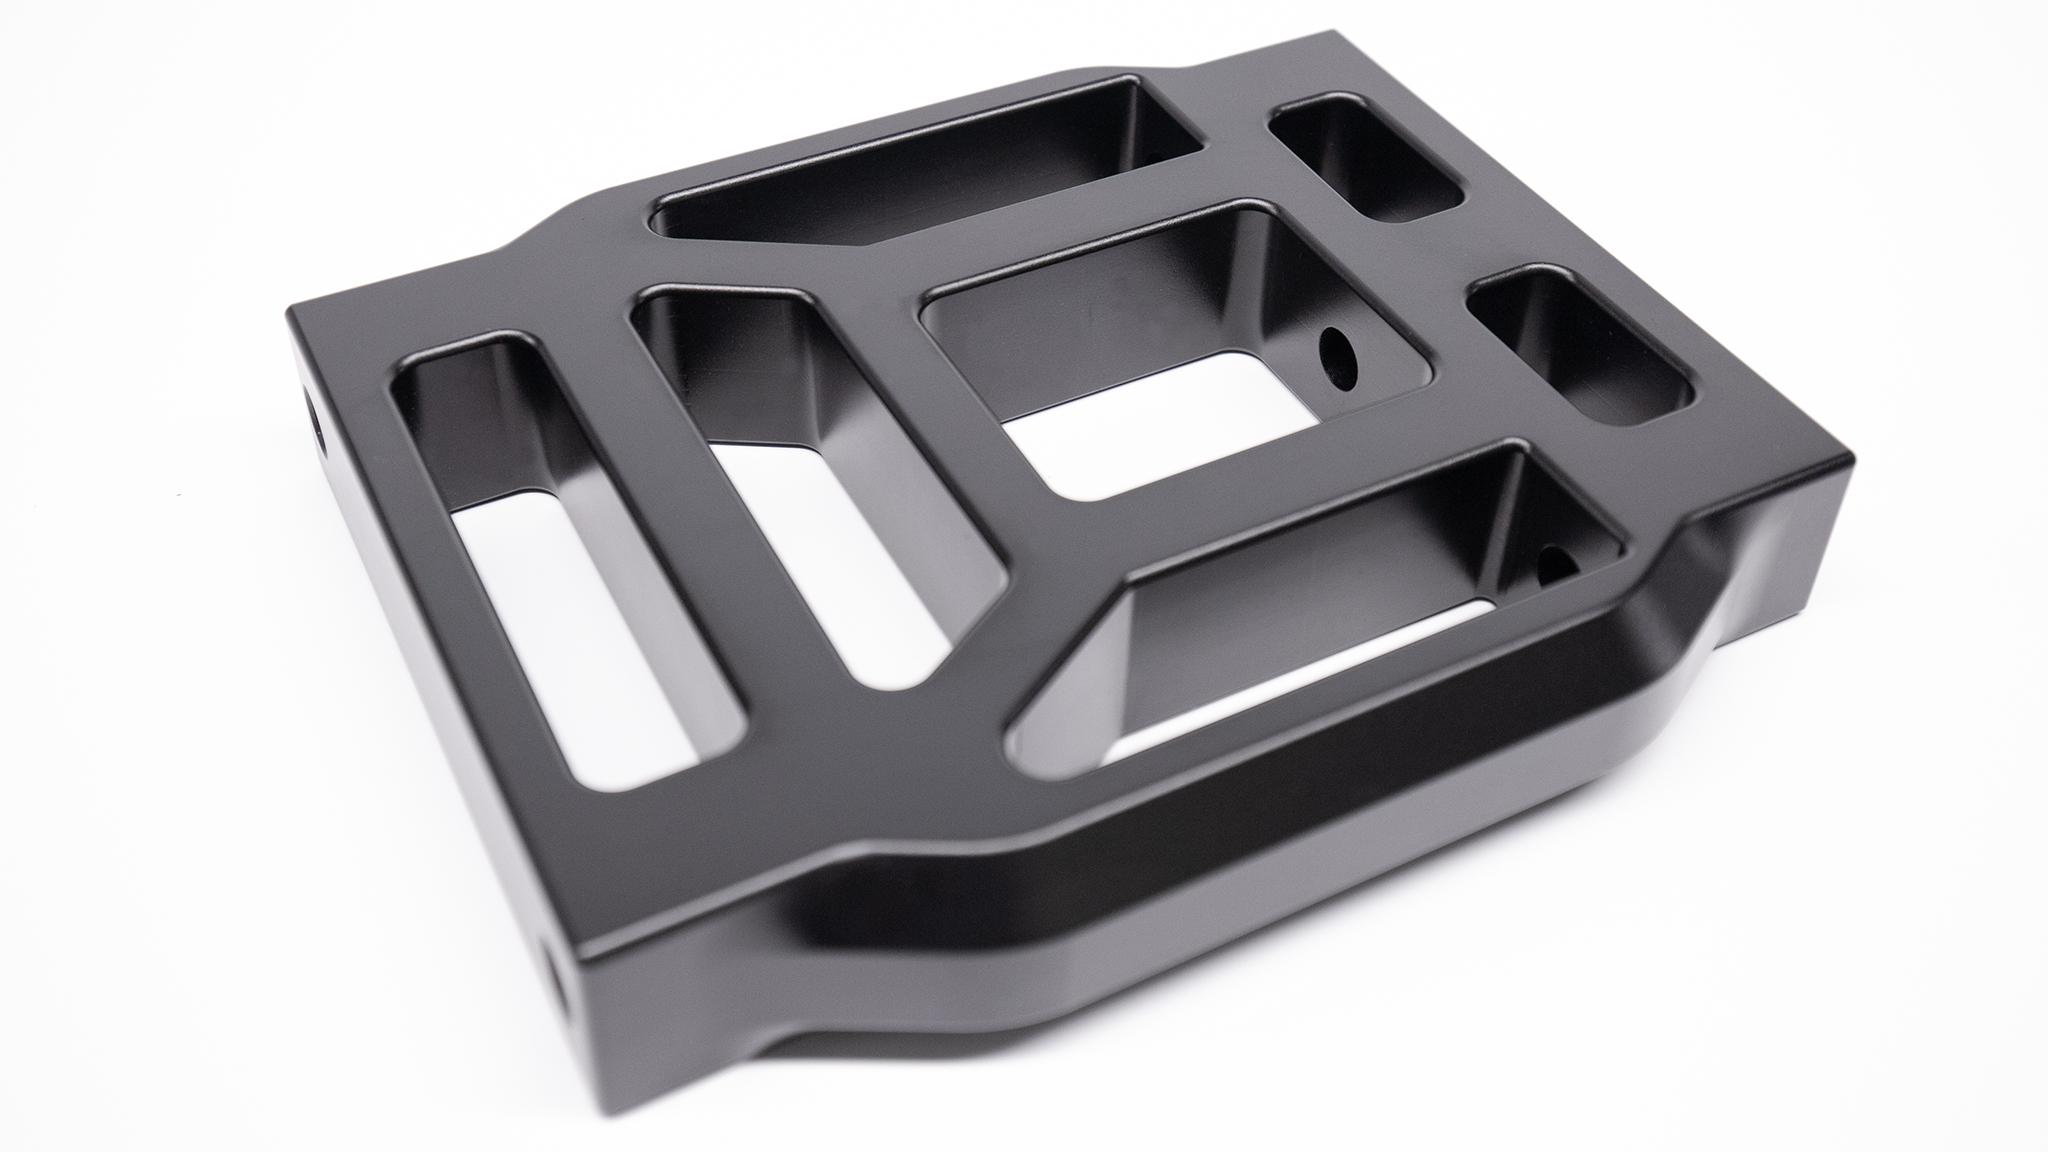 180mm extension block